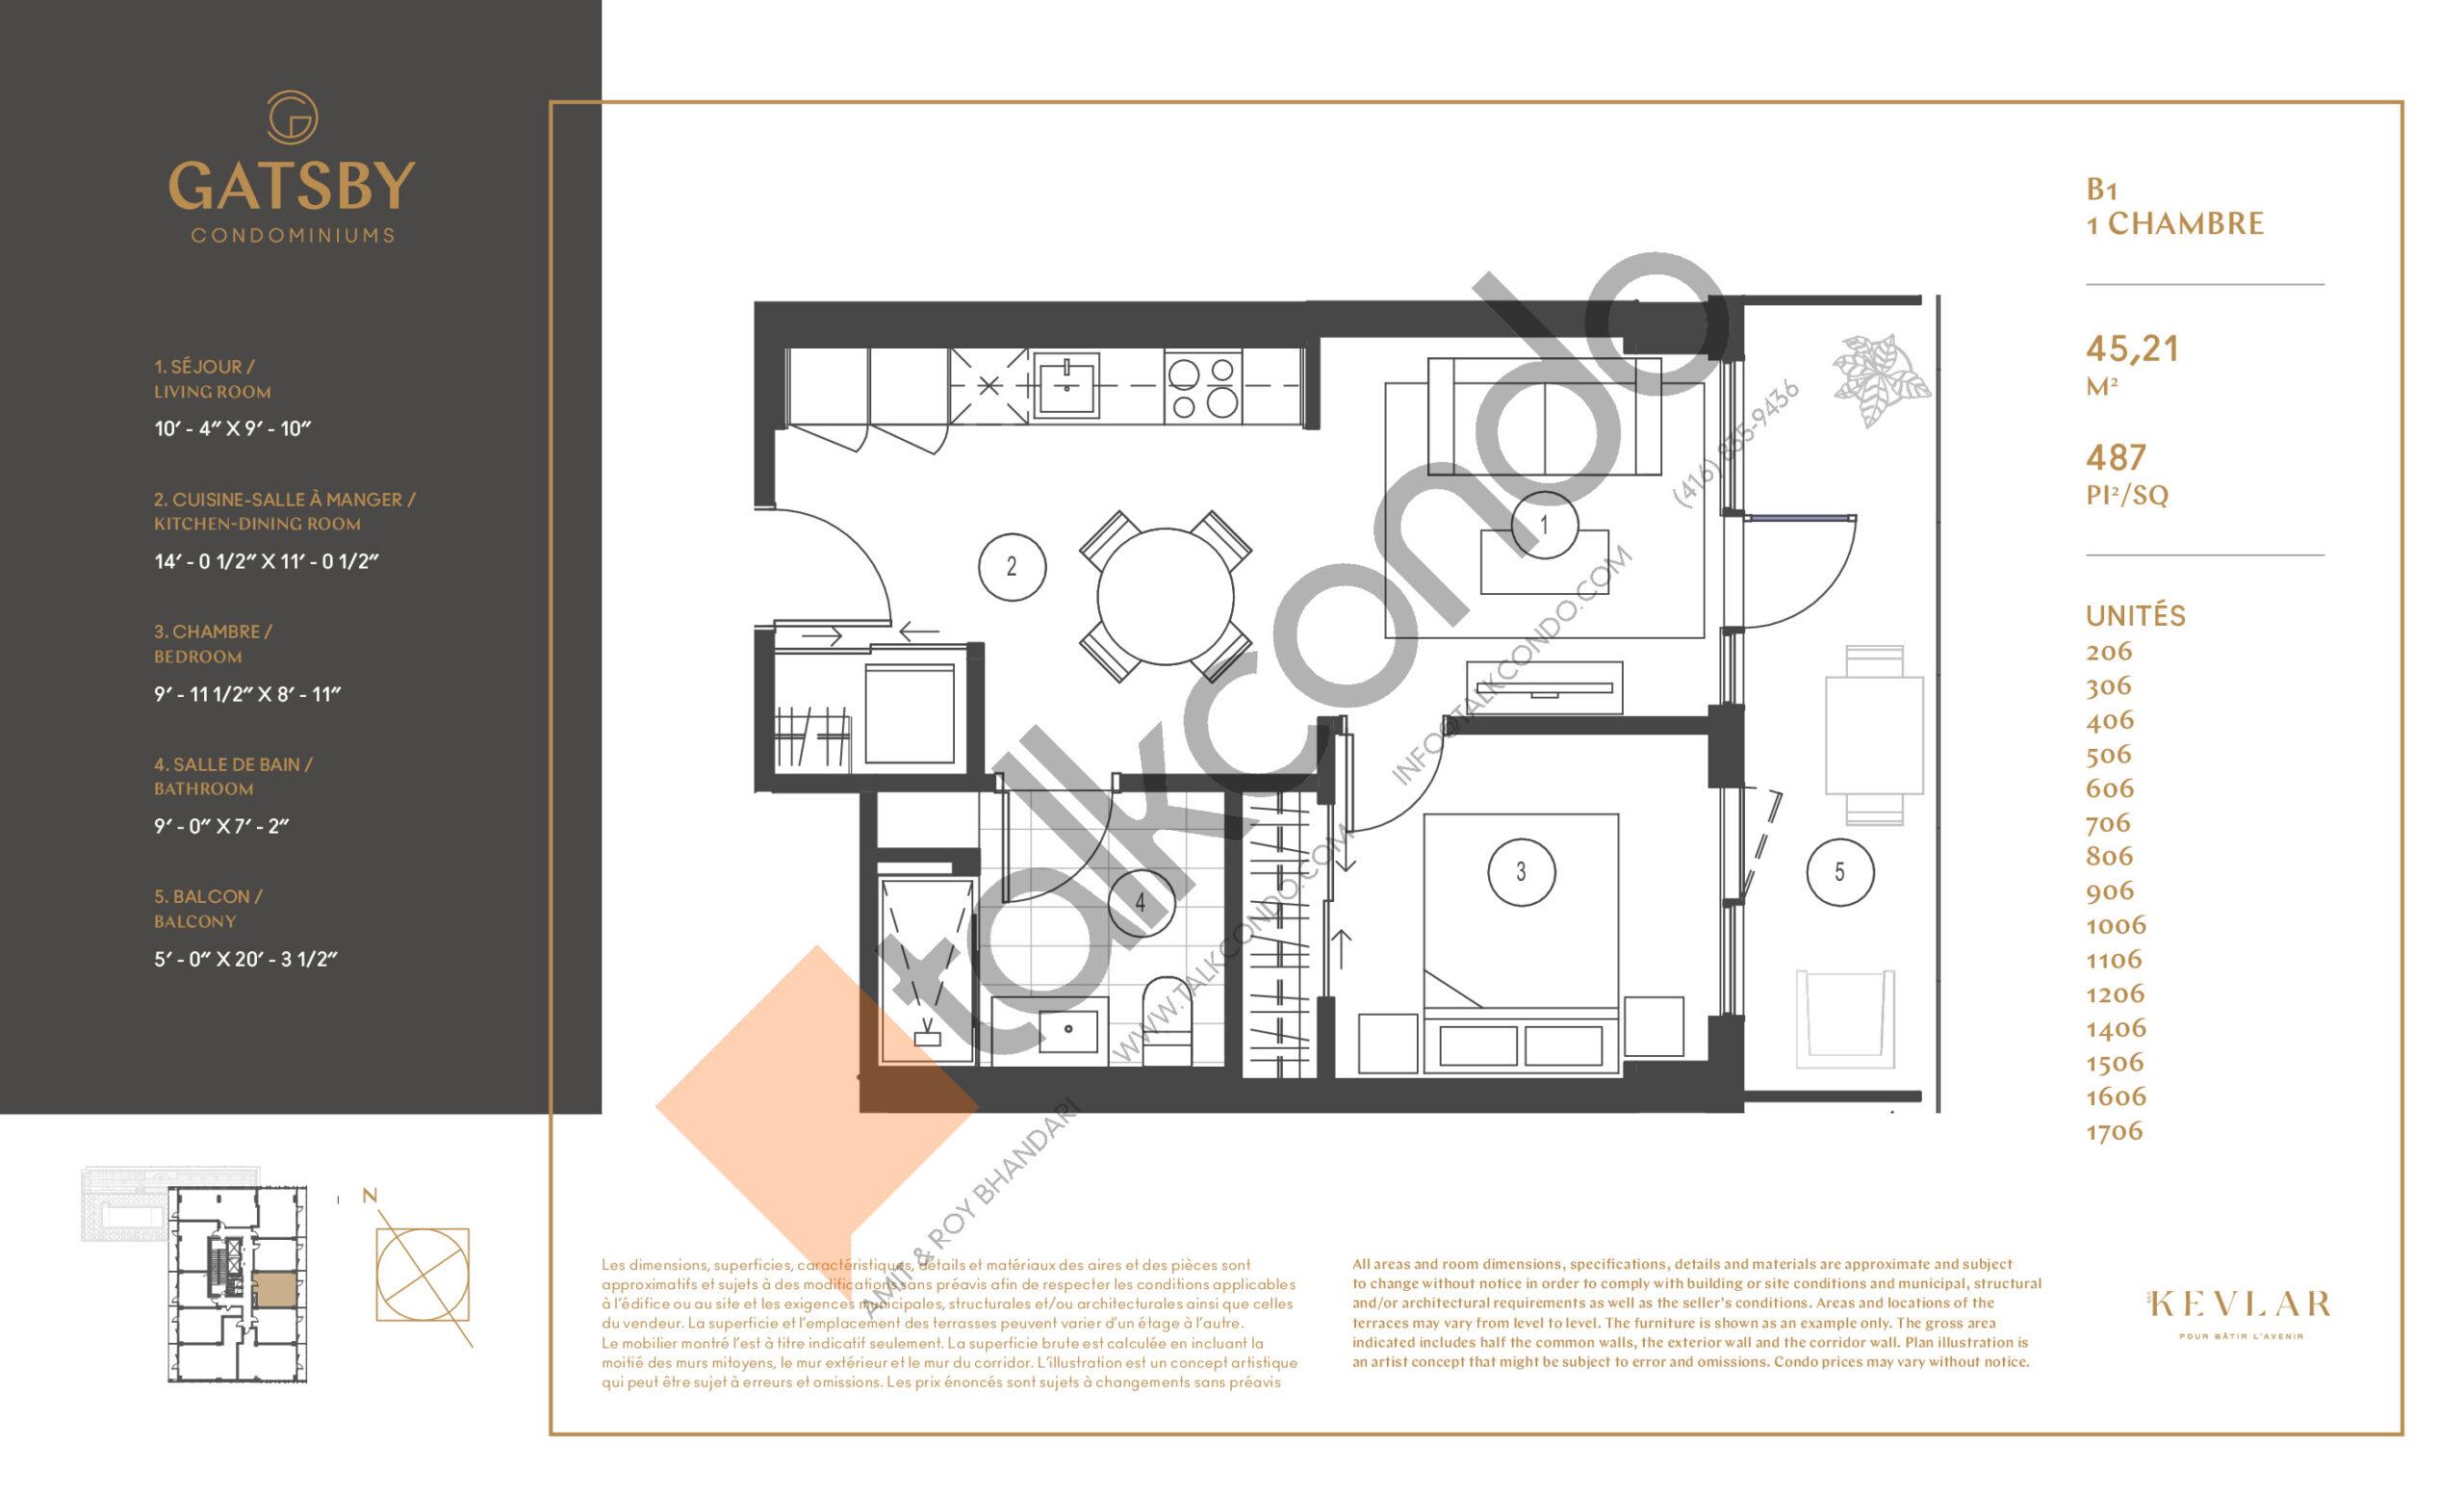 B1 Floor Plan at Gatsby Condos - 487 sq.ft